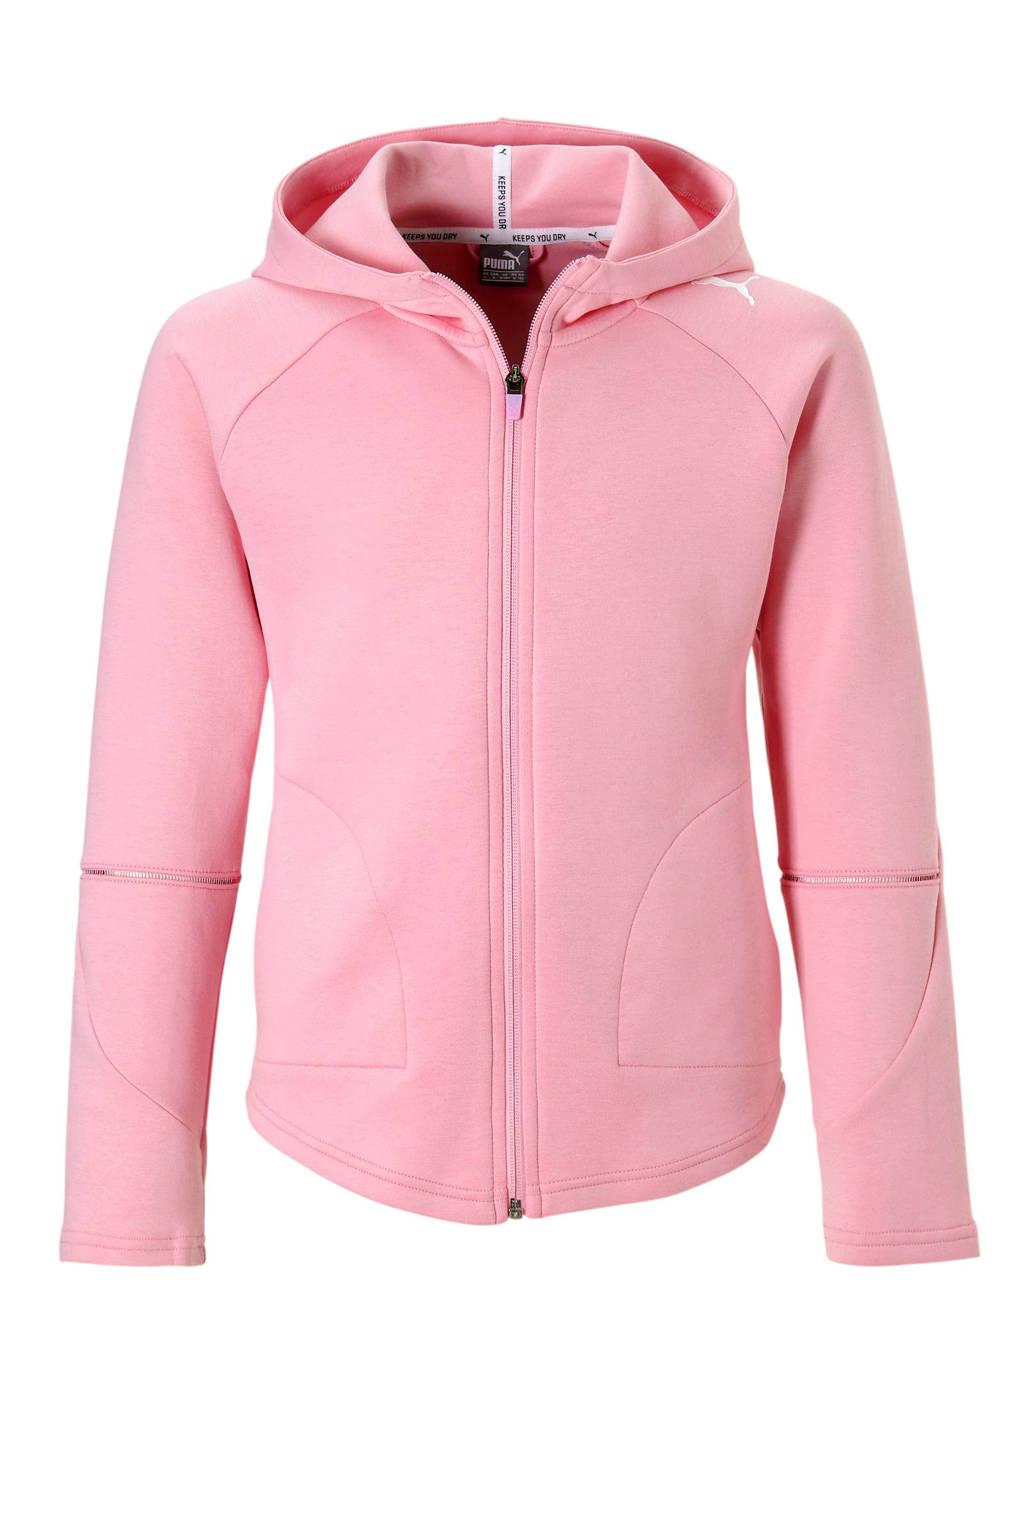 Puma vest roze, Roze